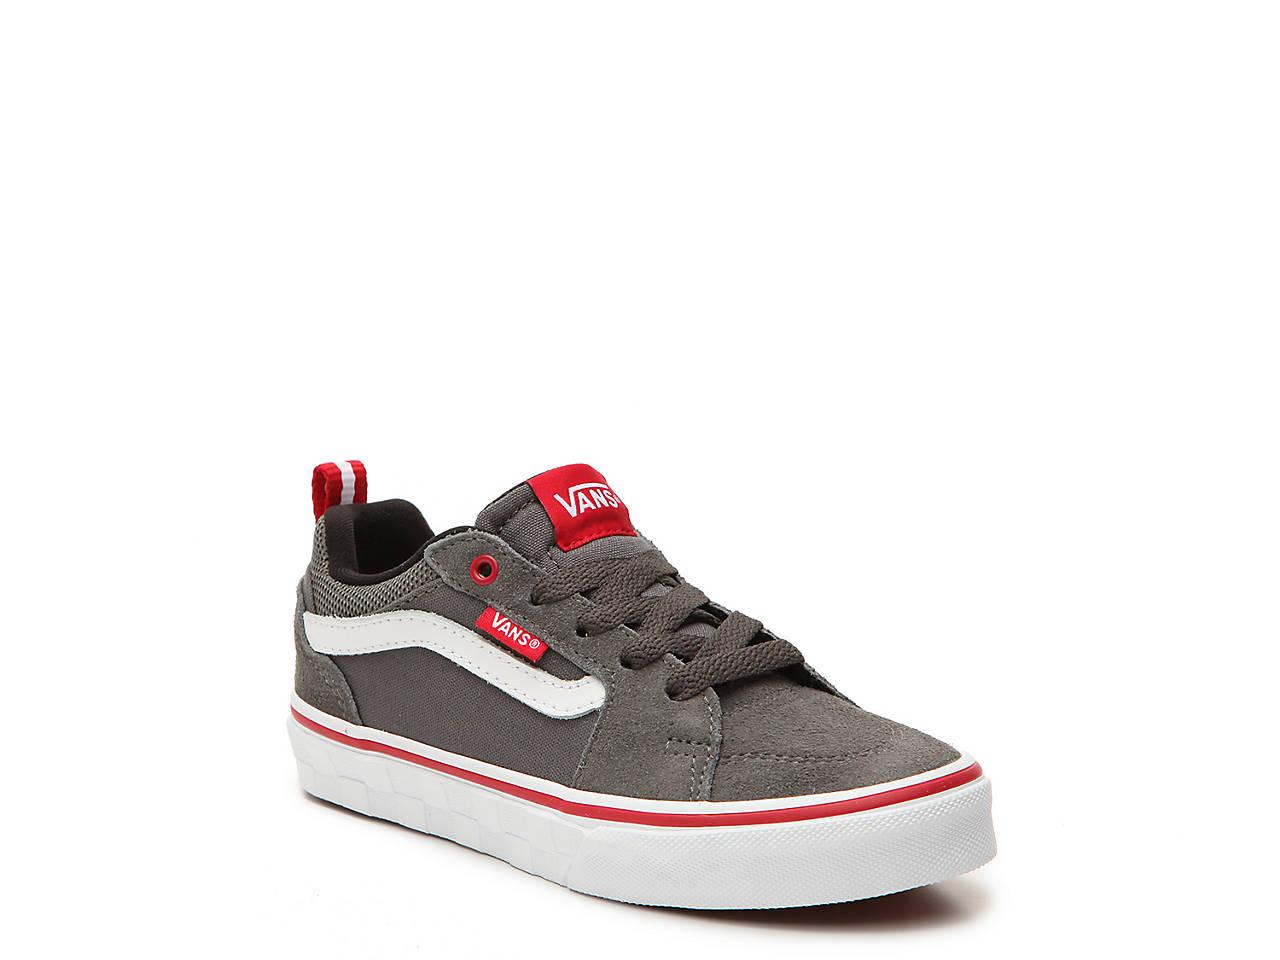 7ae25eae Filmore Sneaker - Kids'